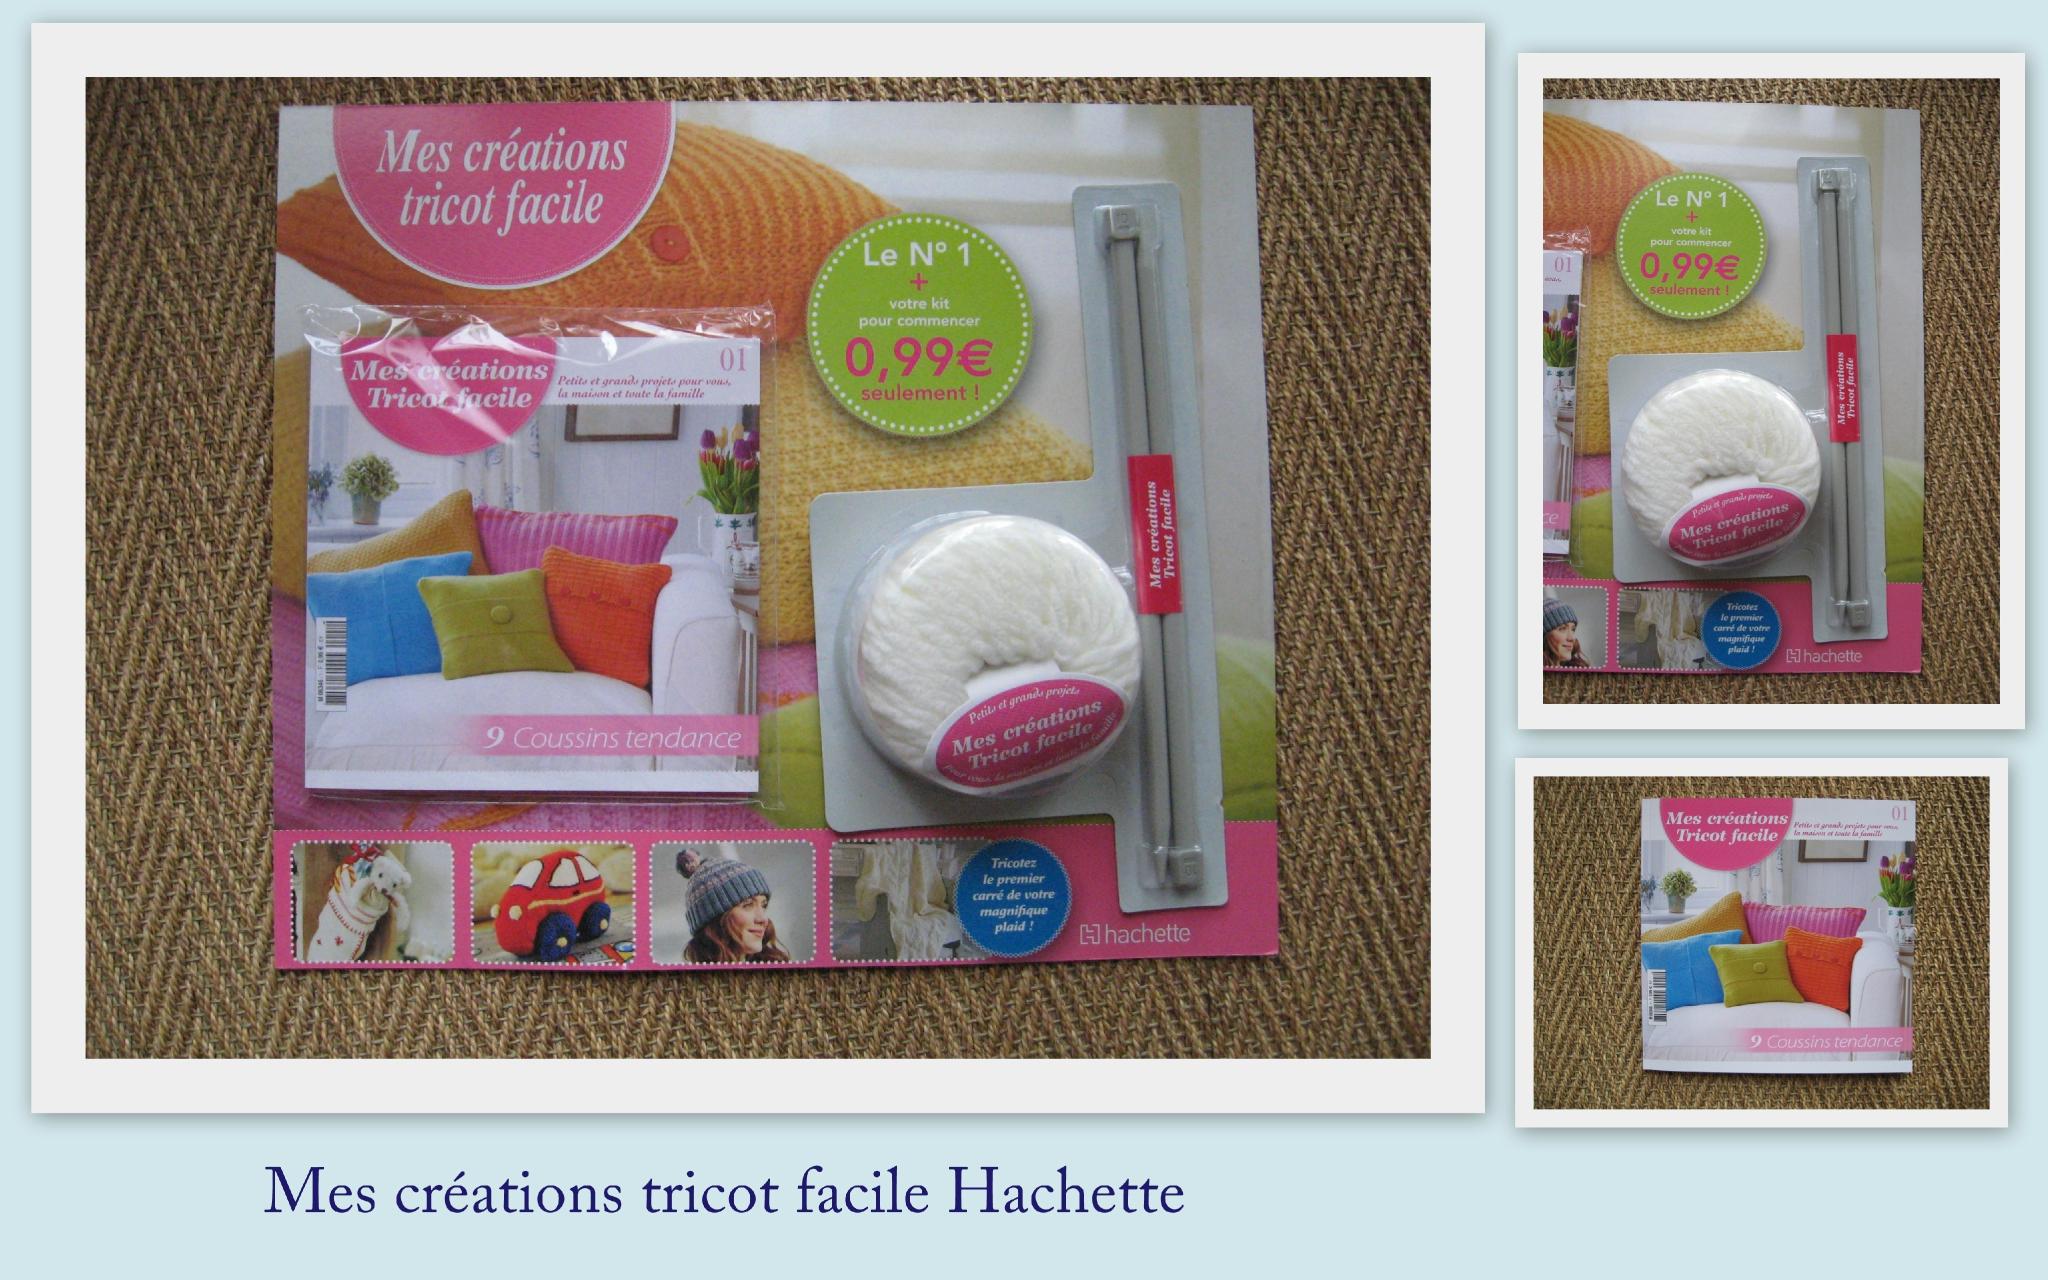 Tricot facile + hachette collection